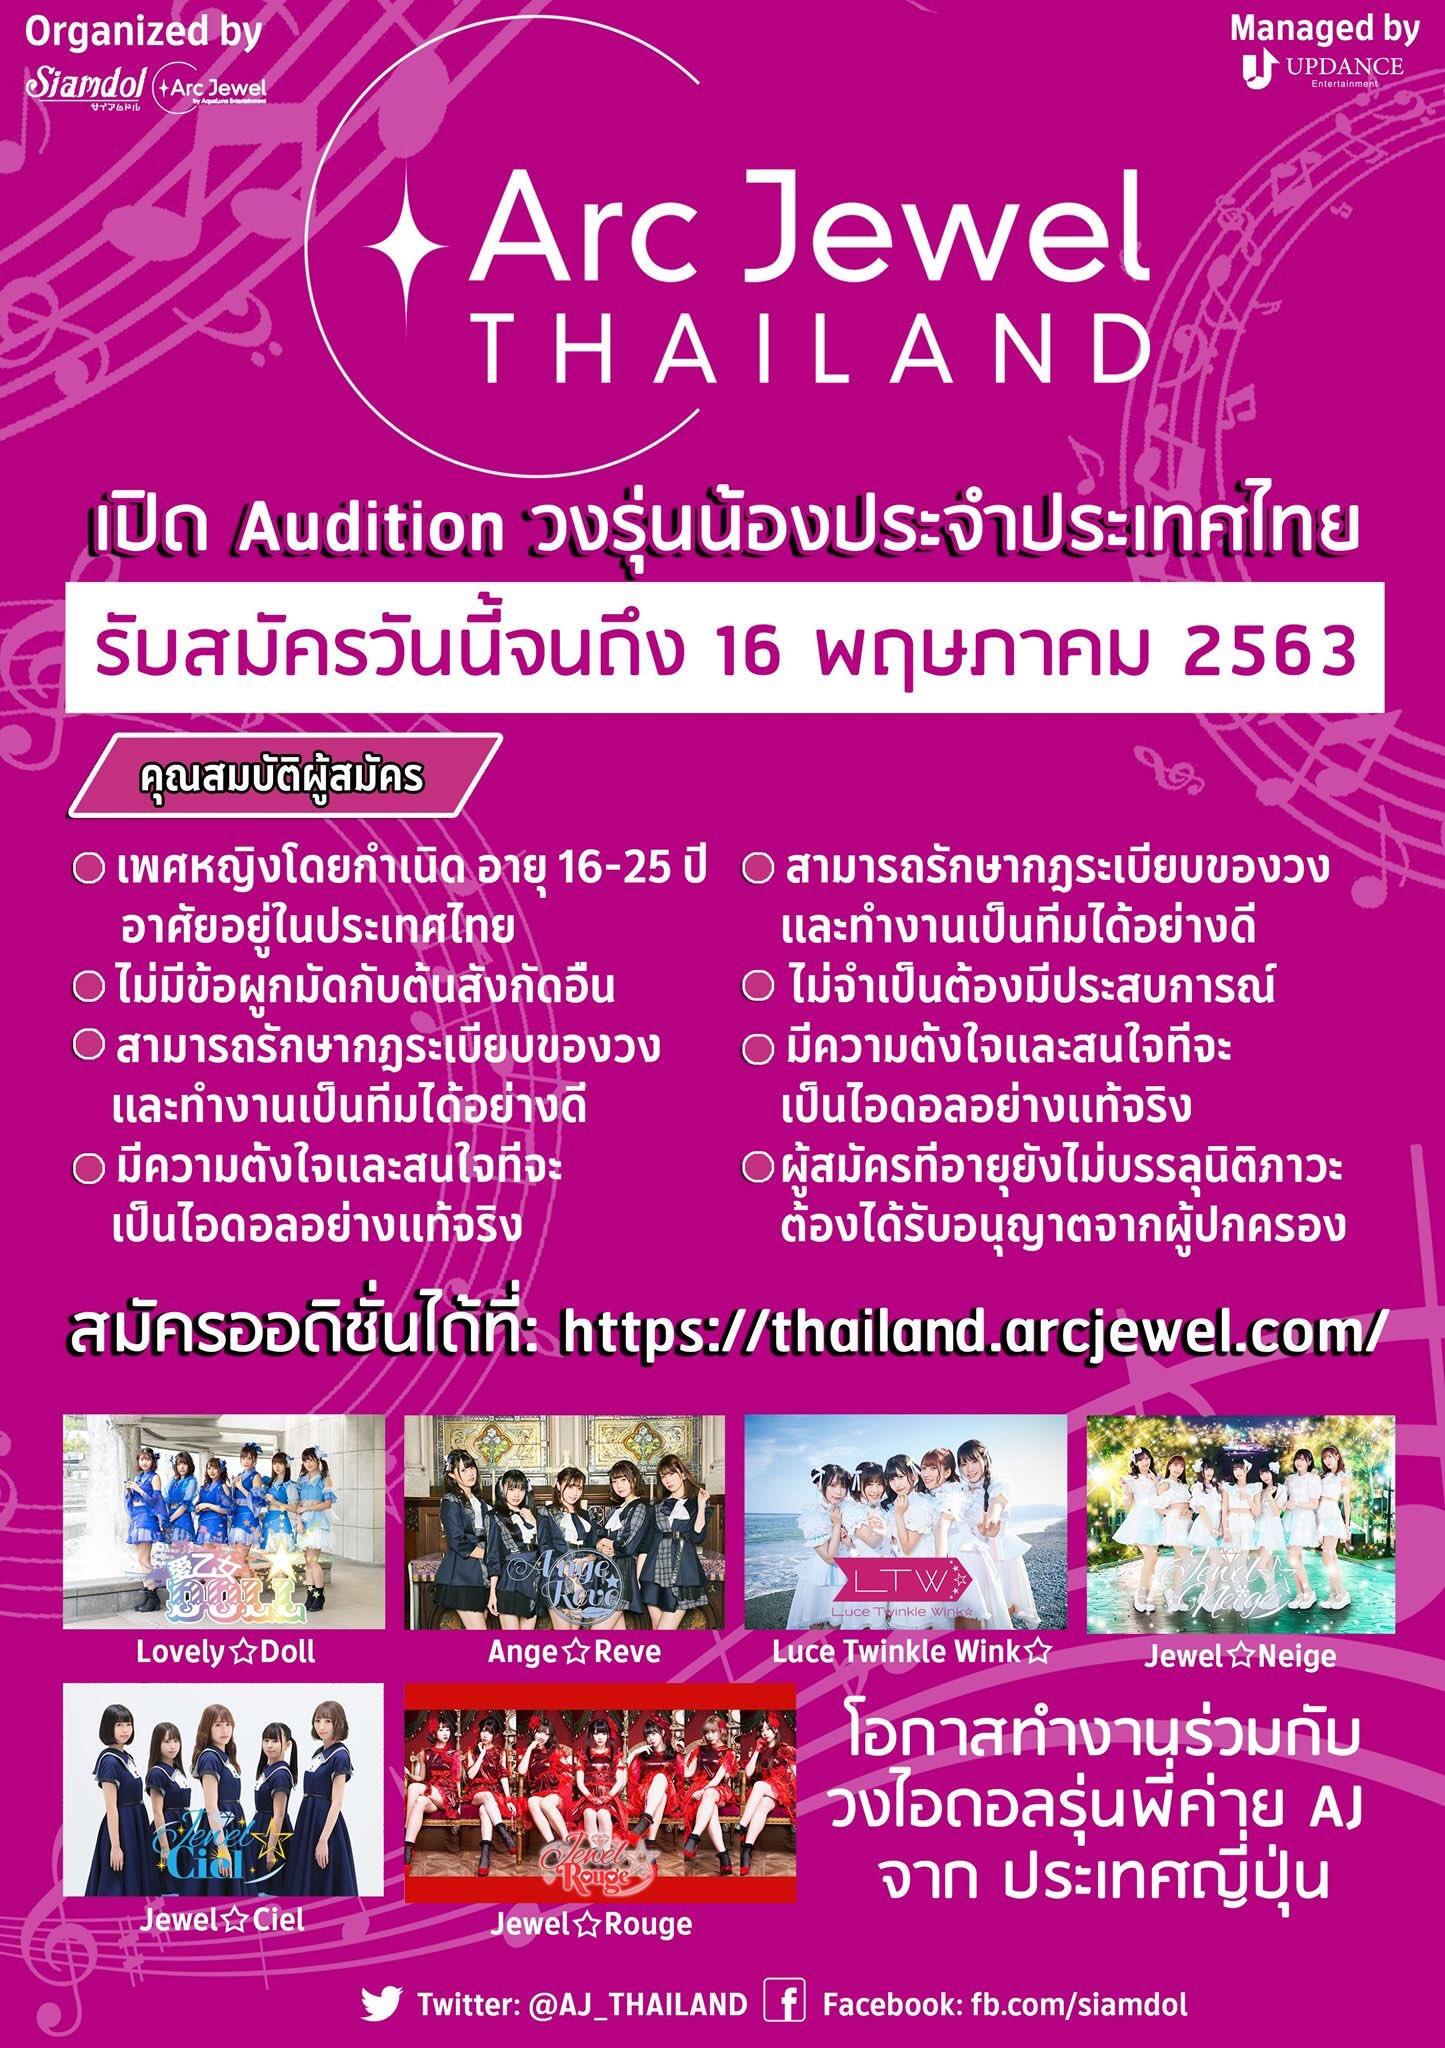 「ArcJewel Thailand」メンバー募集オーディションがスタート